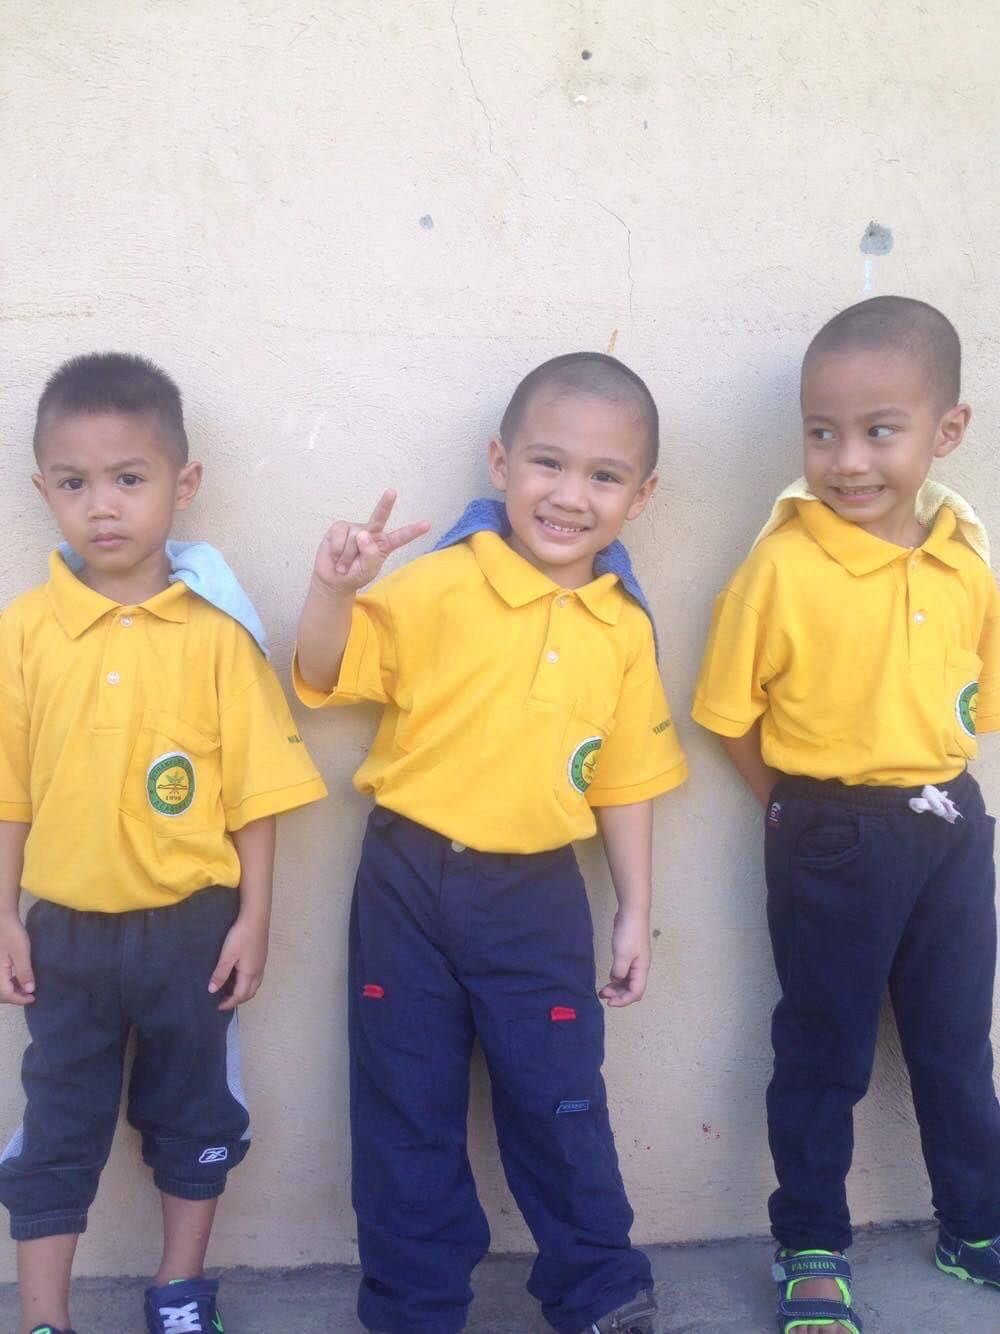 School is starting. Good luck dear students!